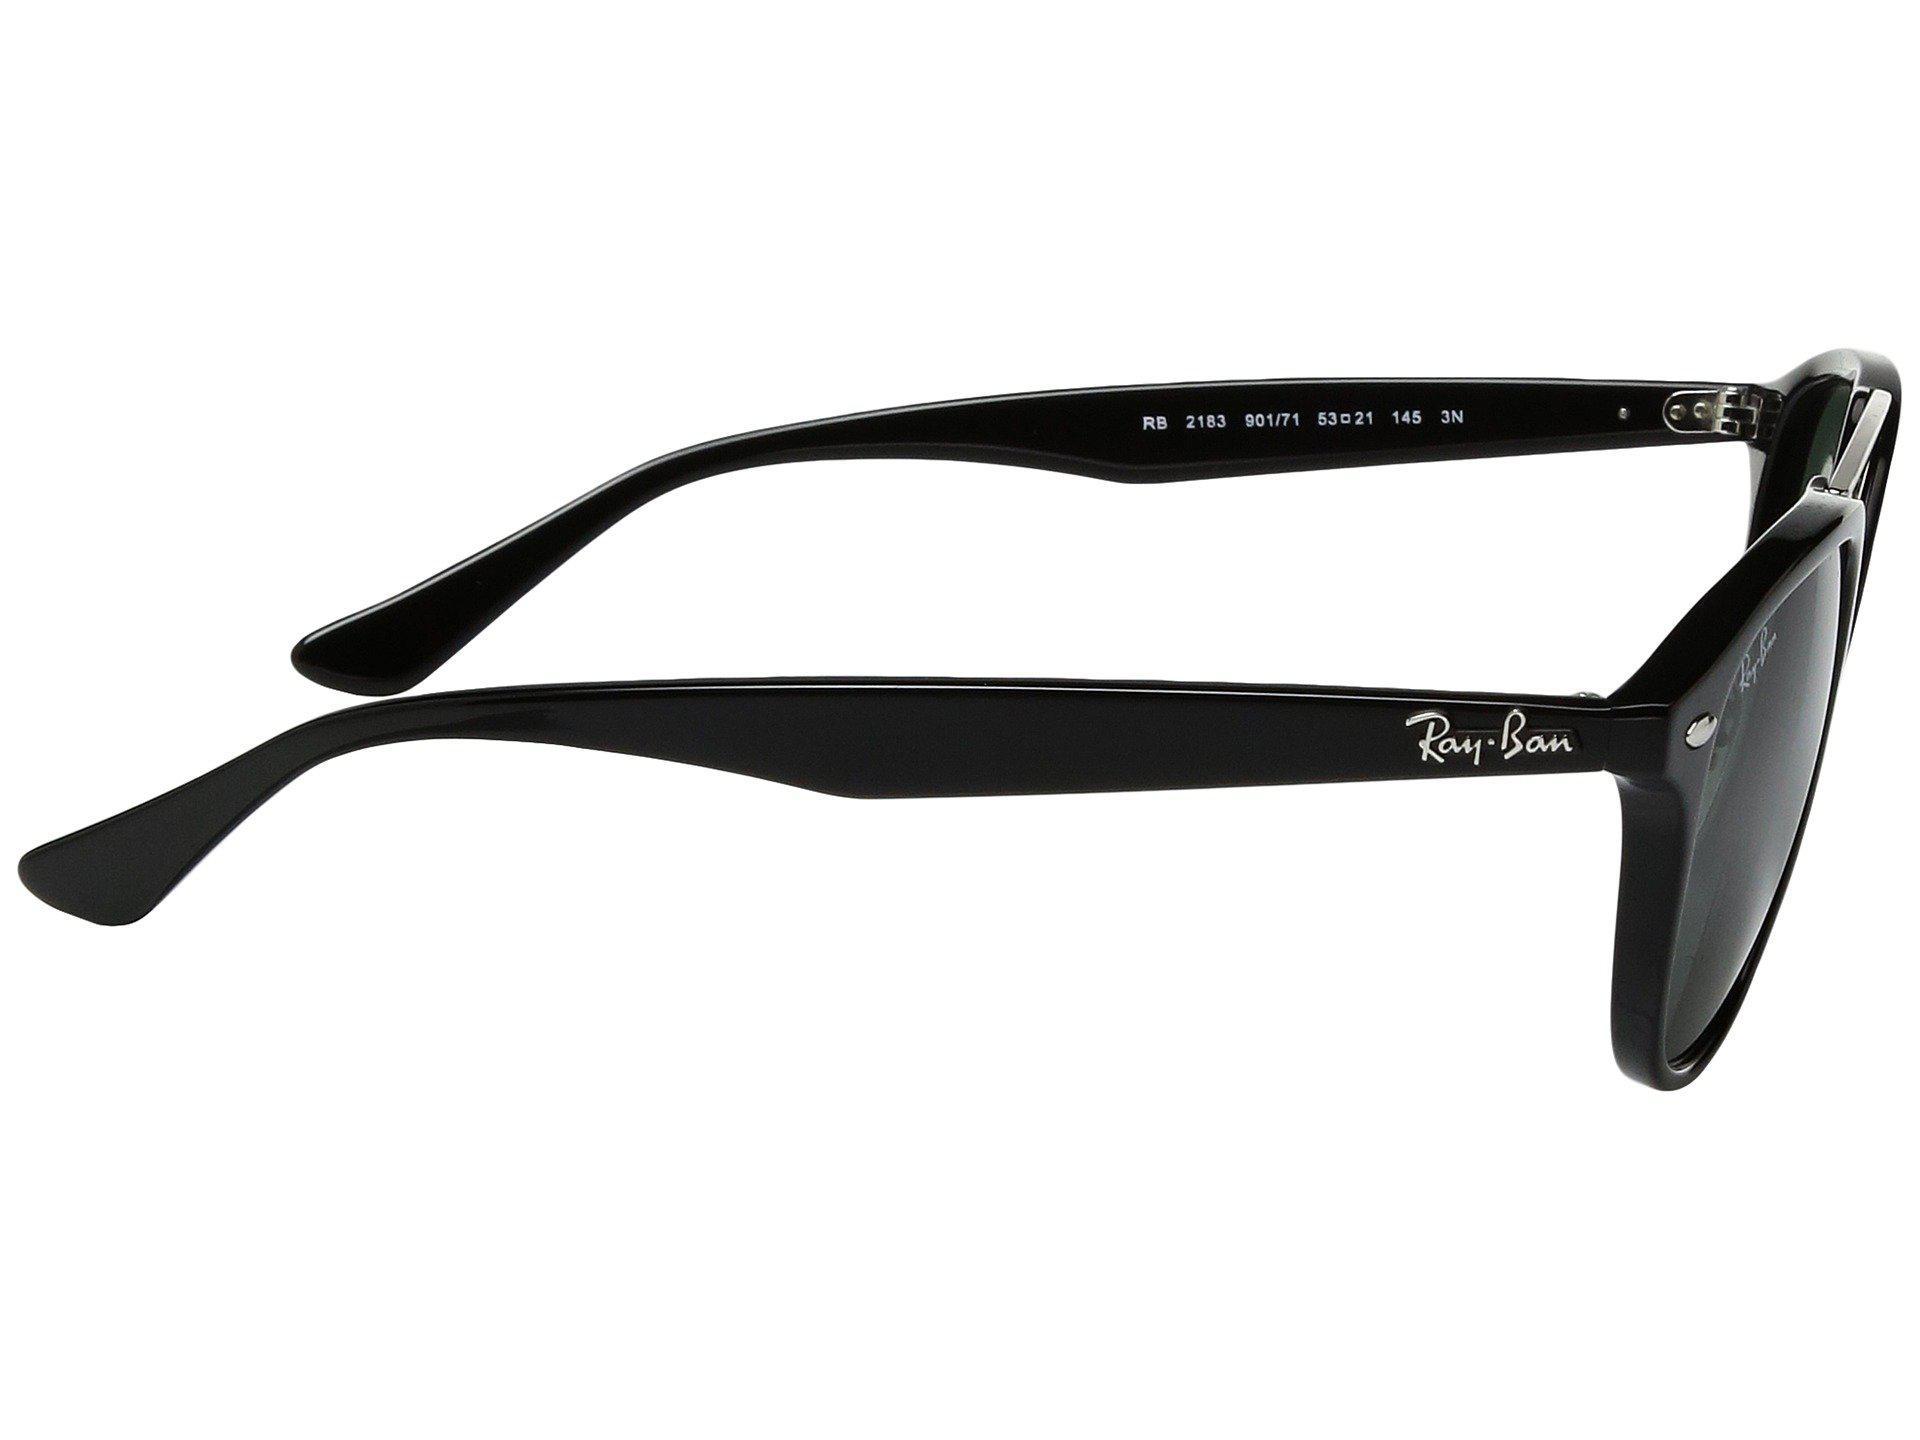 9db3c04229 Ray-Ban - 0rb2183 53mm (black Frame dark Green Lens) Fashion Sunglasses.  View fullscreen